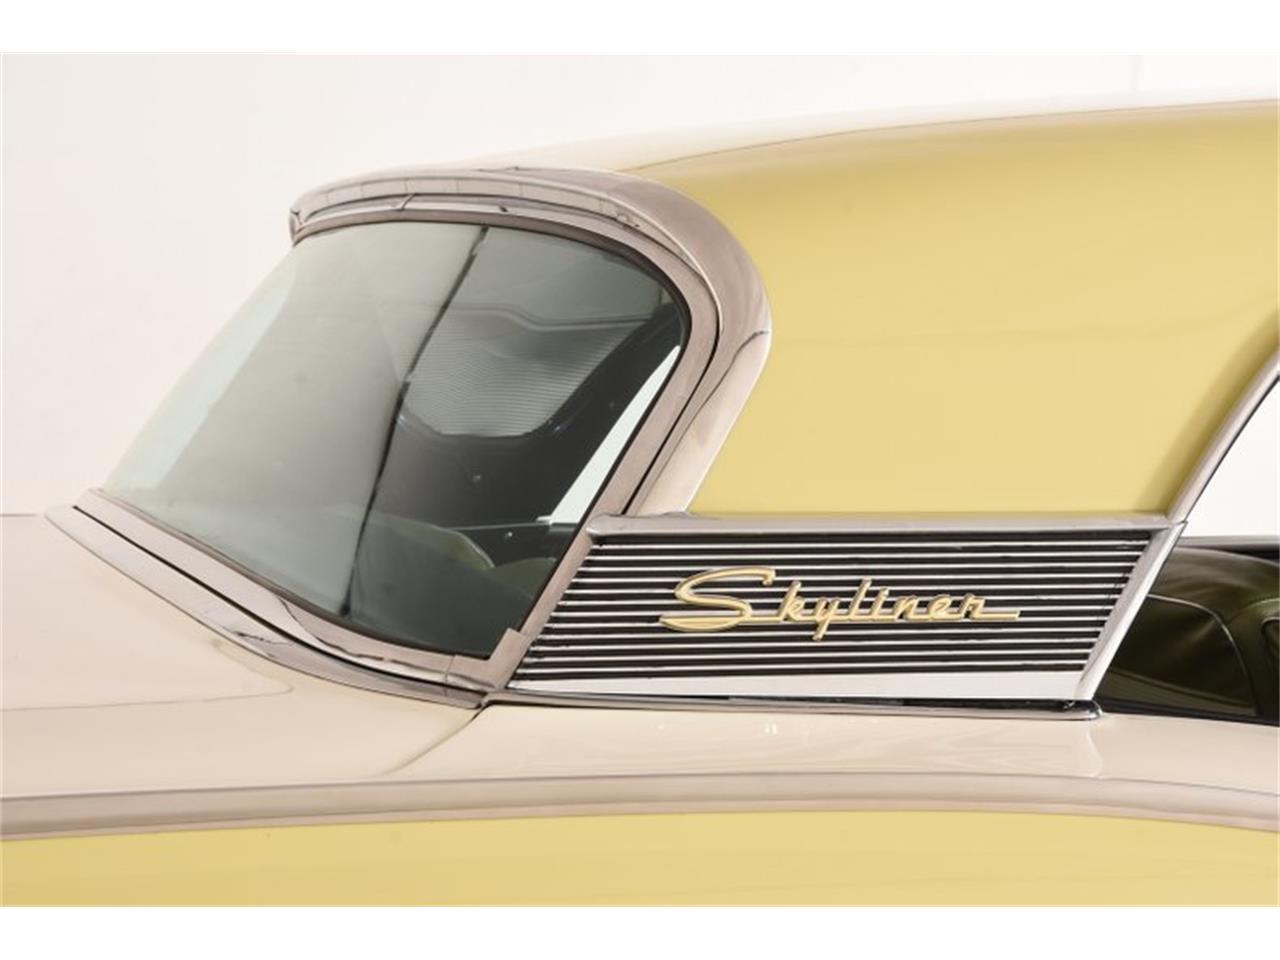 Large Picture of '59 Fairlane located in Volo Illinois - $42,998.00 - OTK2